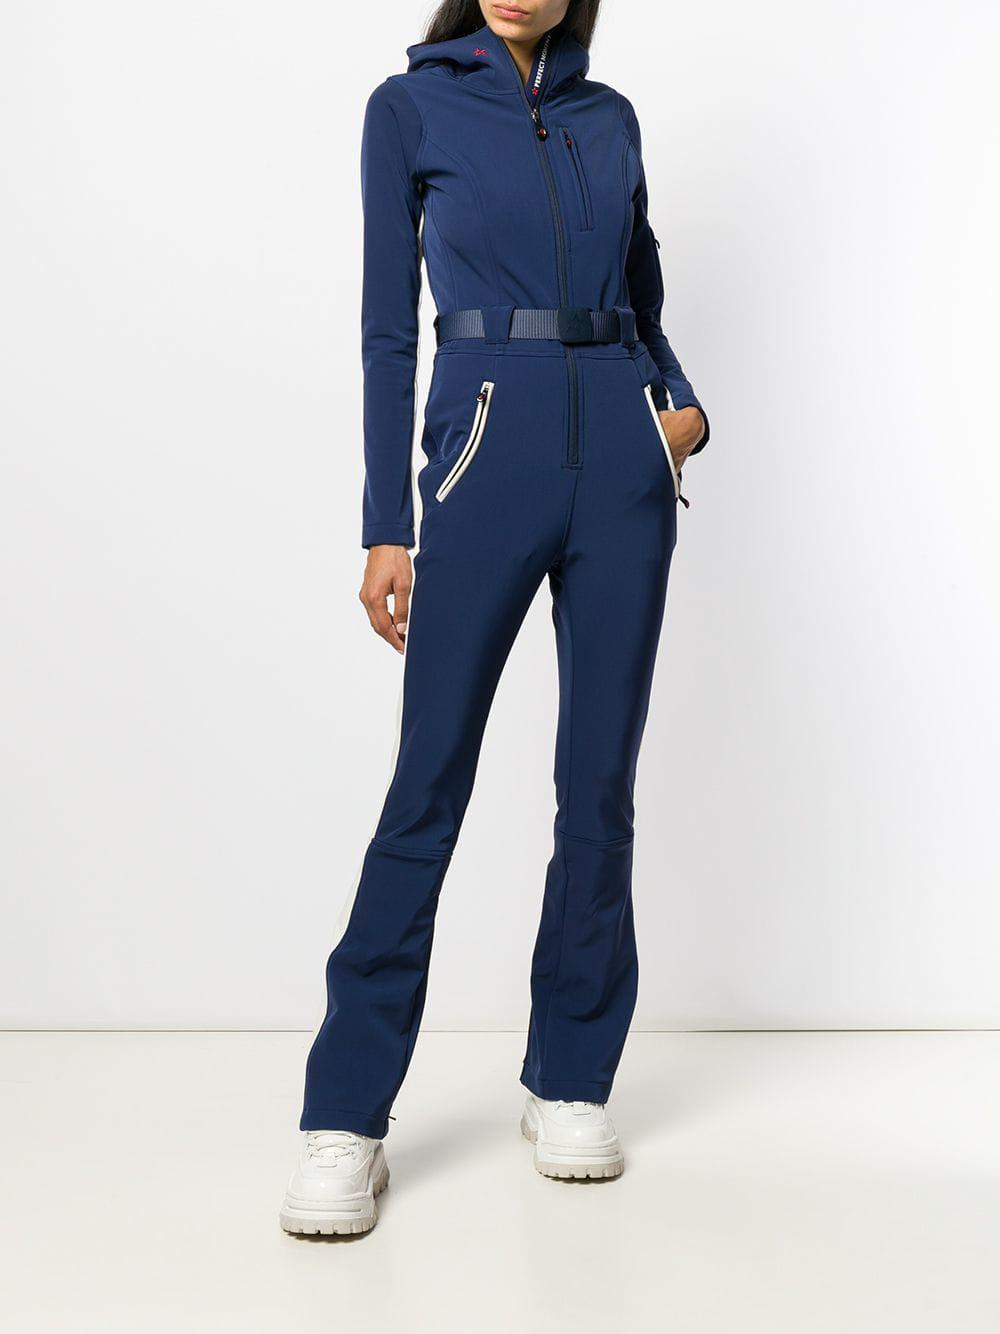 5b9184544041 Lyst - Perfect Moment Gt Ski Jumpsuit in Blue